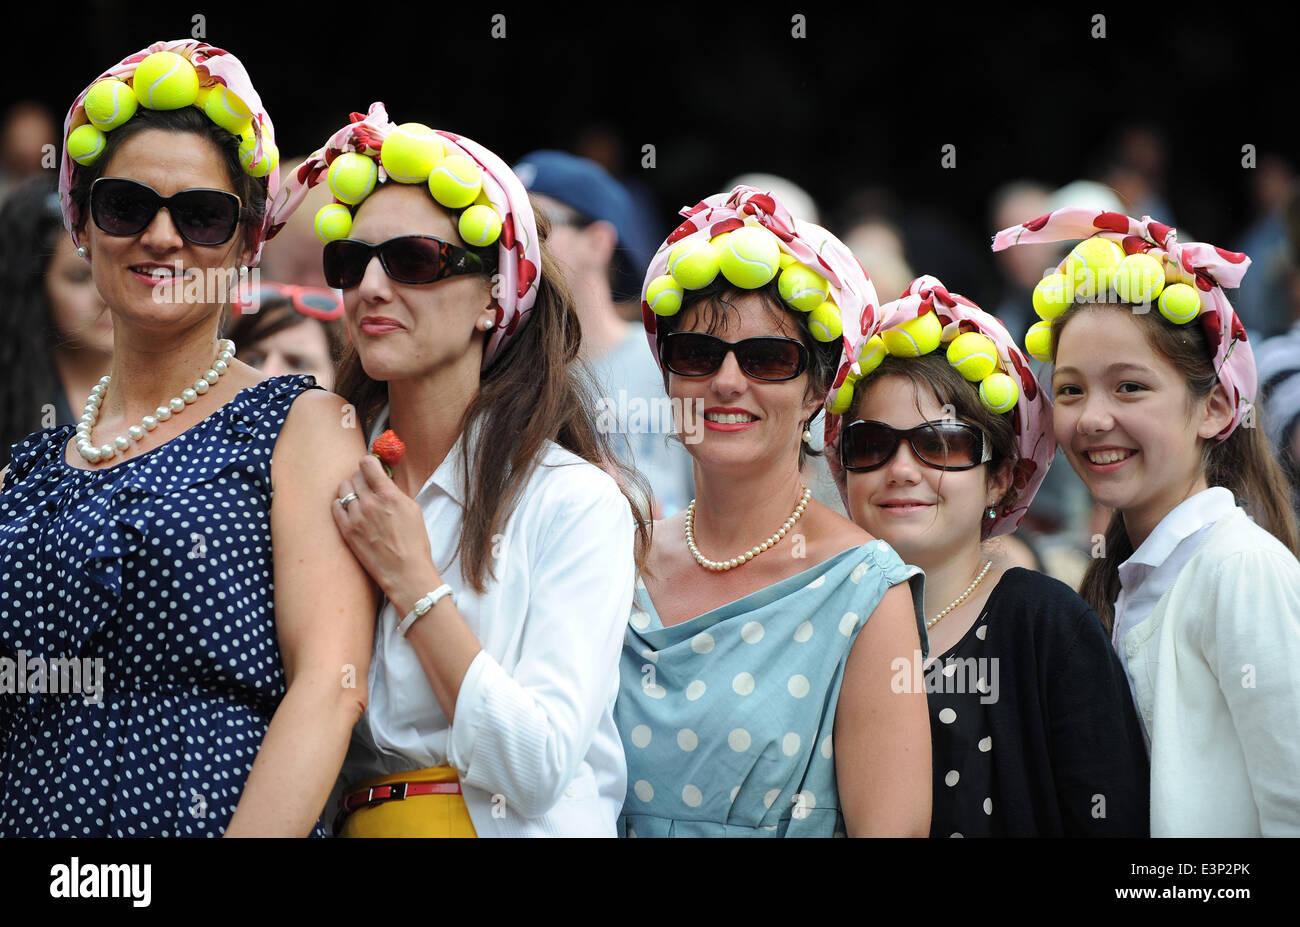 WIMBLEDON CROWD WITH TENNIS BA THE WIMBLEDON CHAMPIONSHIPS 20 THE ALL ENGLAND TENNIS CLUB WIMBLEDON LONDON ENGLAND Stock Photo